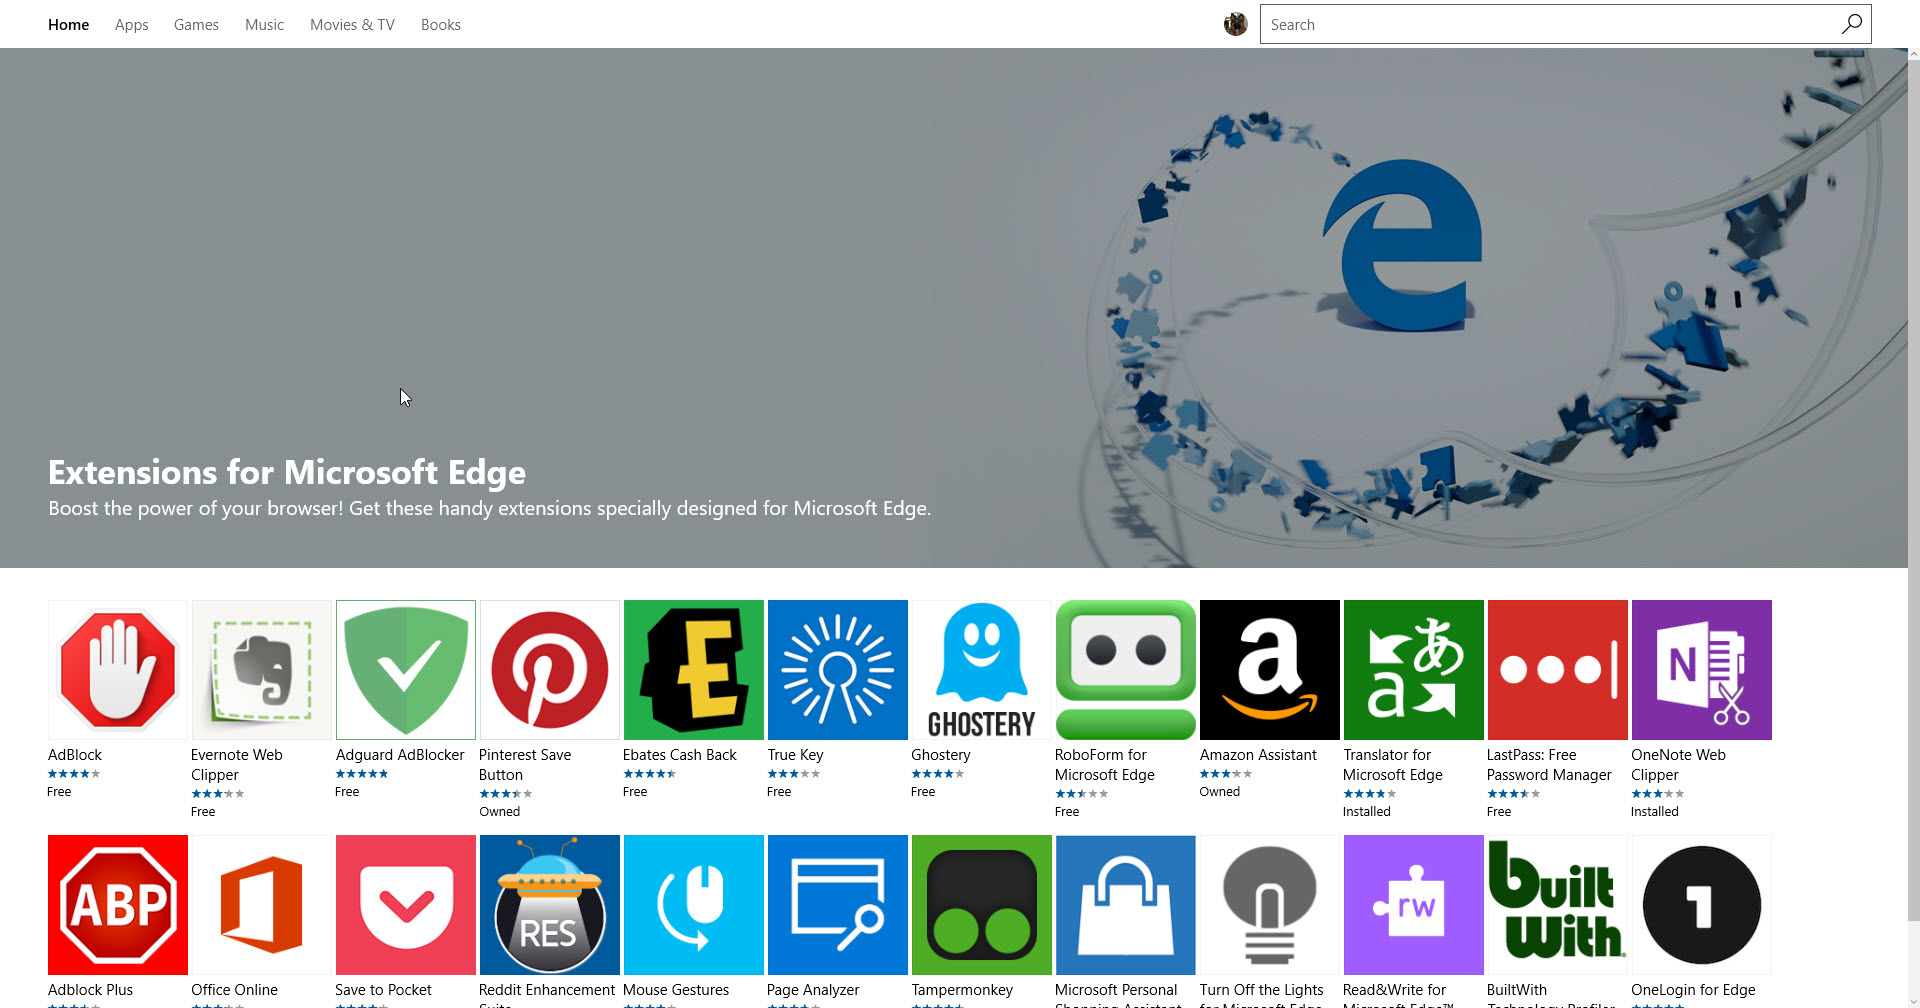 adblock plus for microsoft edge windows 10